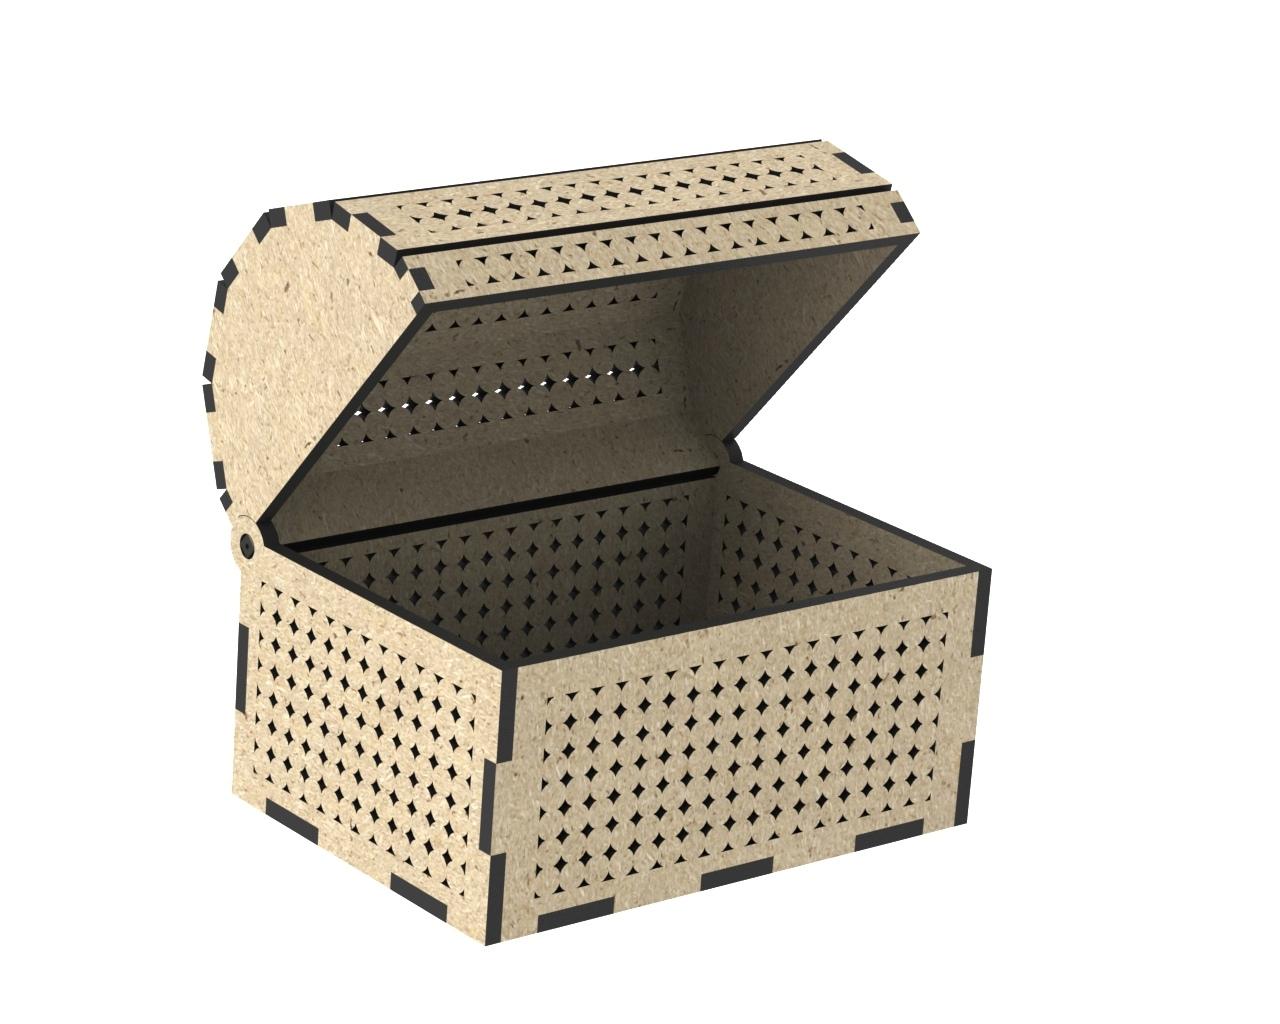 Treasure Chest Jewelry Box Laser Cut Free CDR Vectors Art